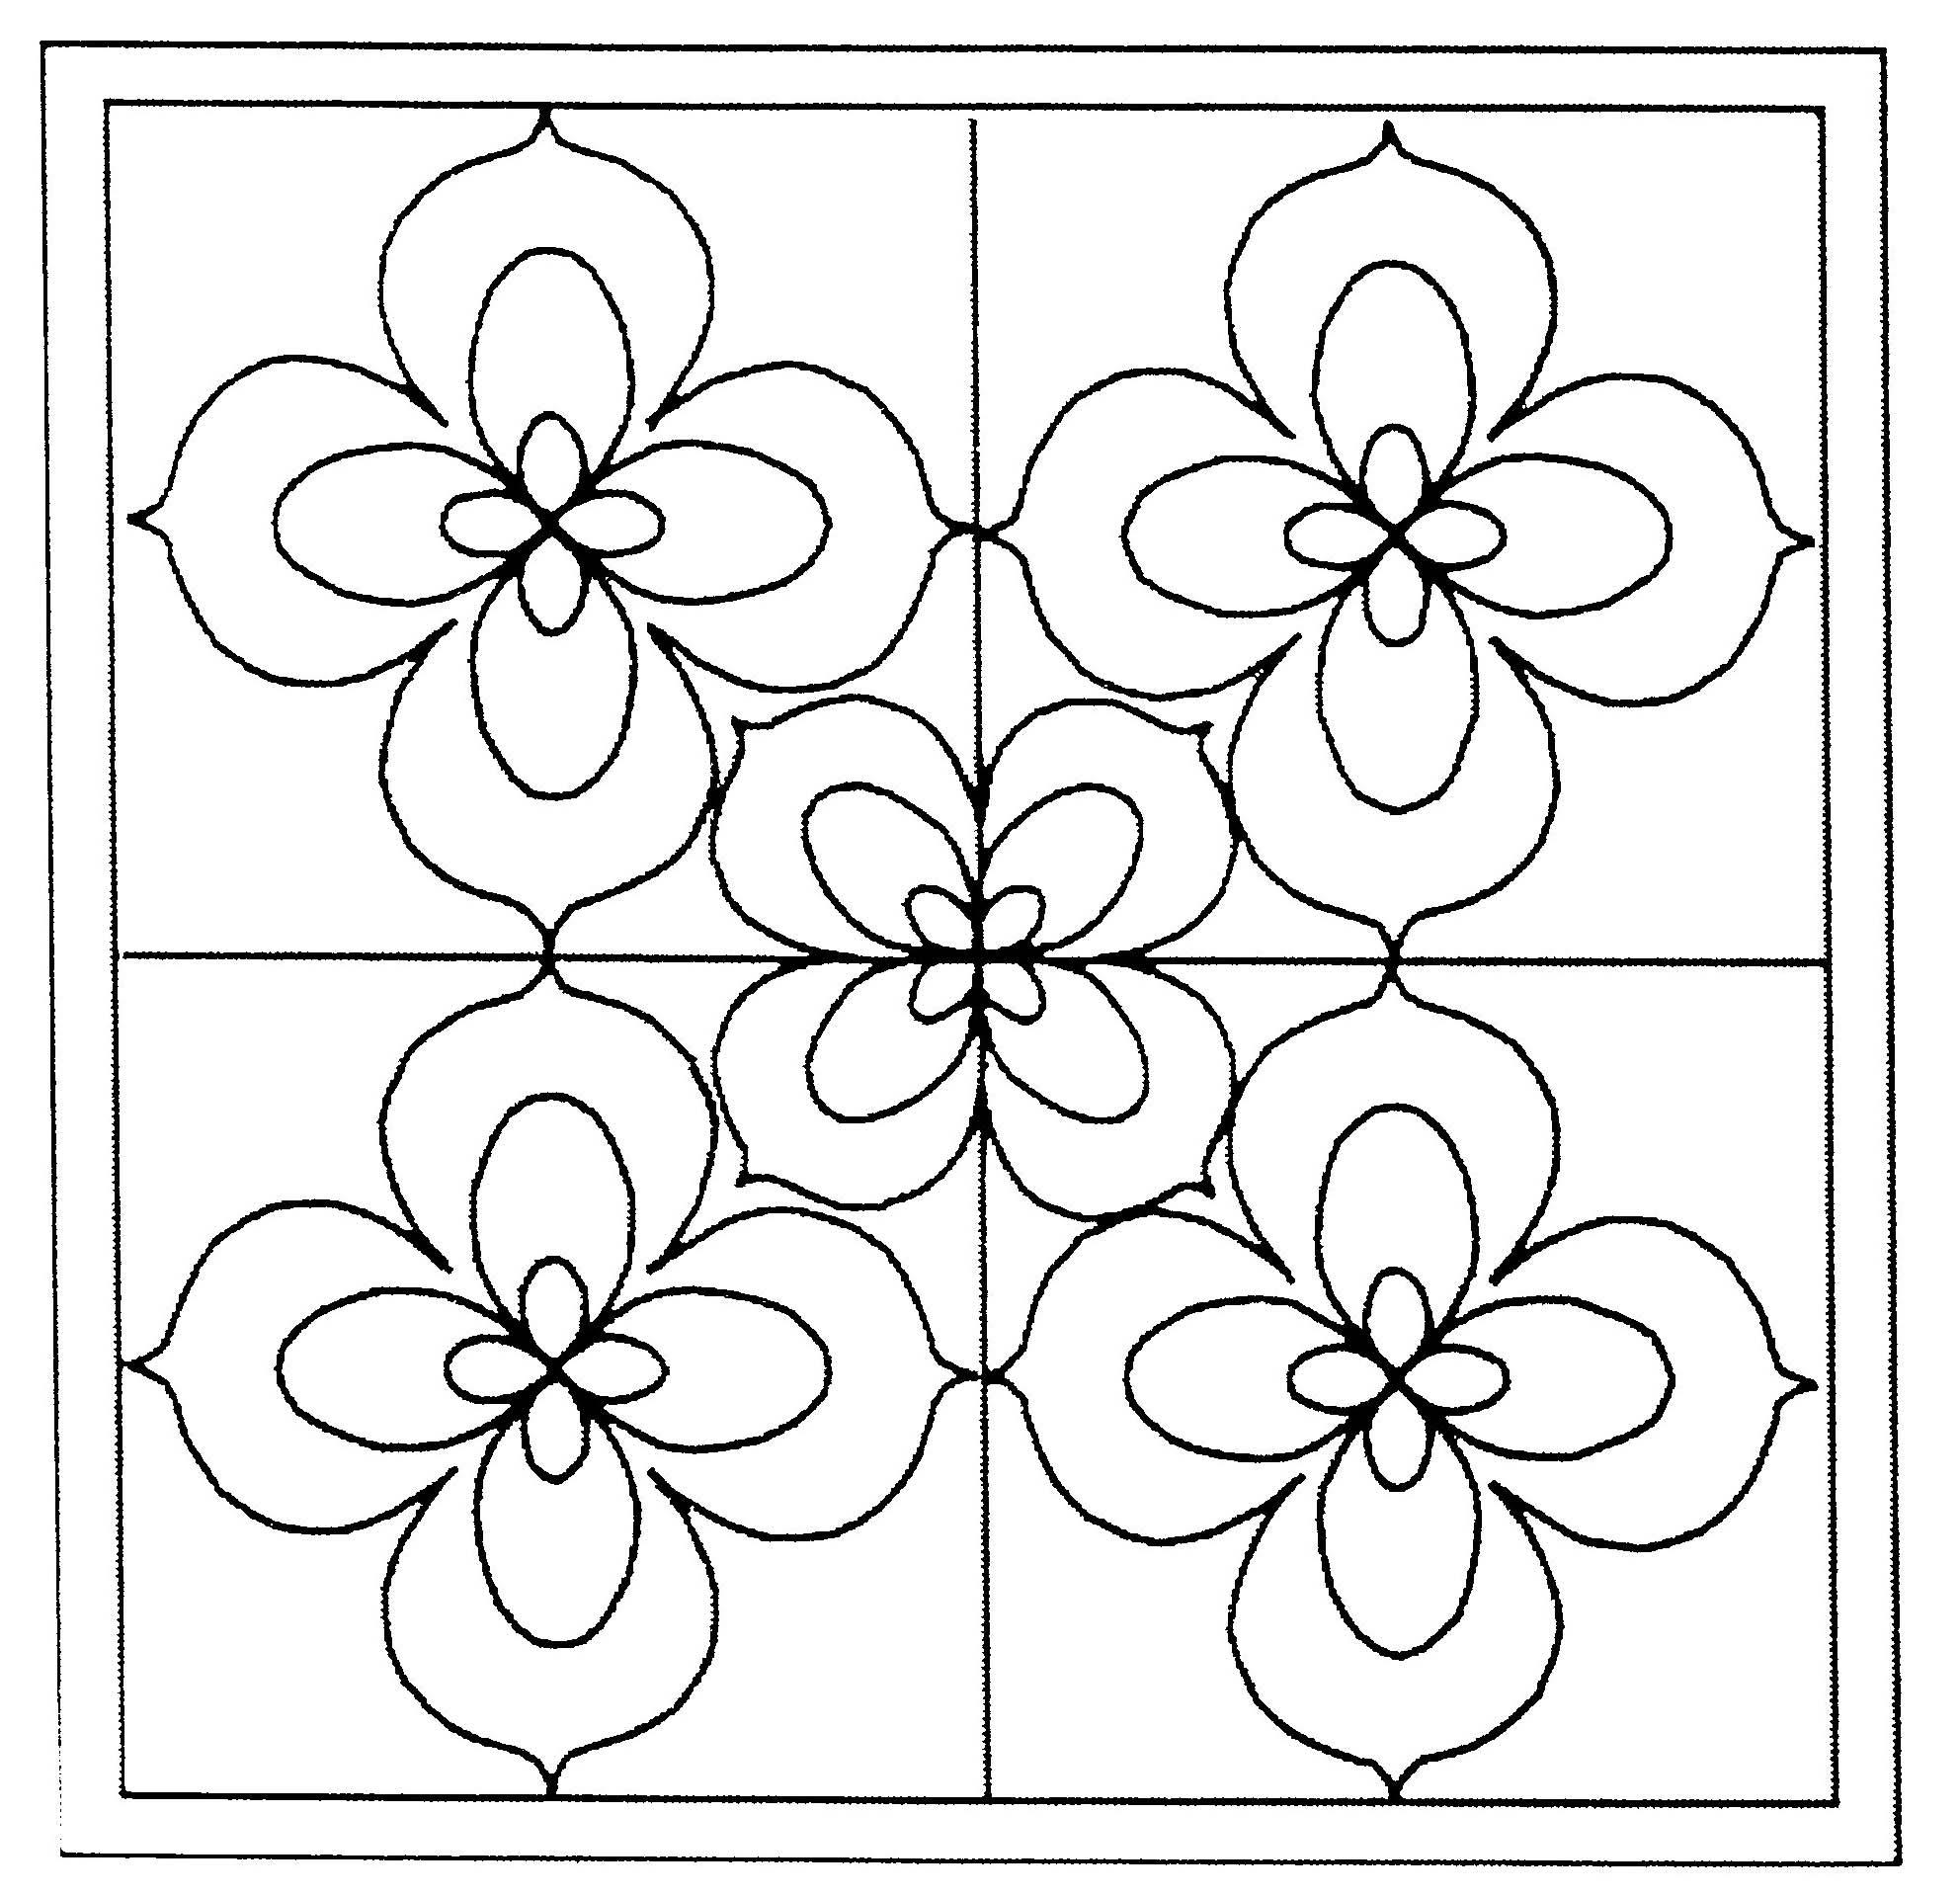 coloriages imprimer fleurs num ro 672858. Black Bedroom Furniture Sets. Home Design Ideas